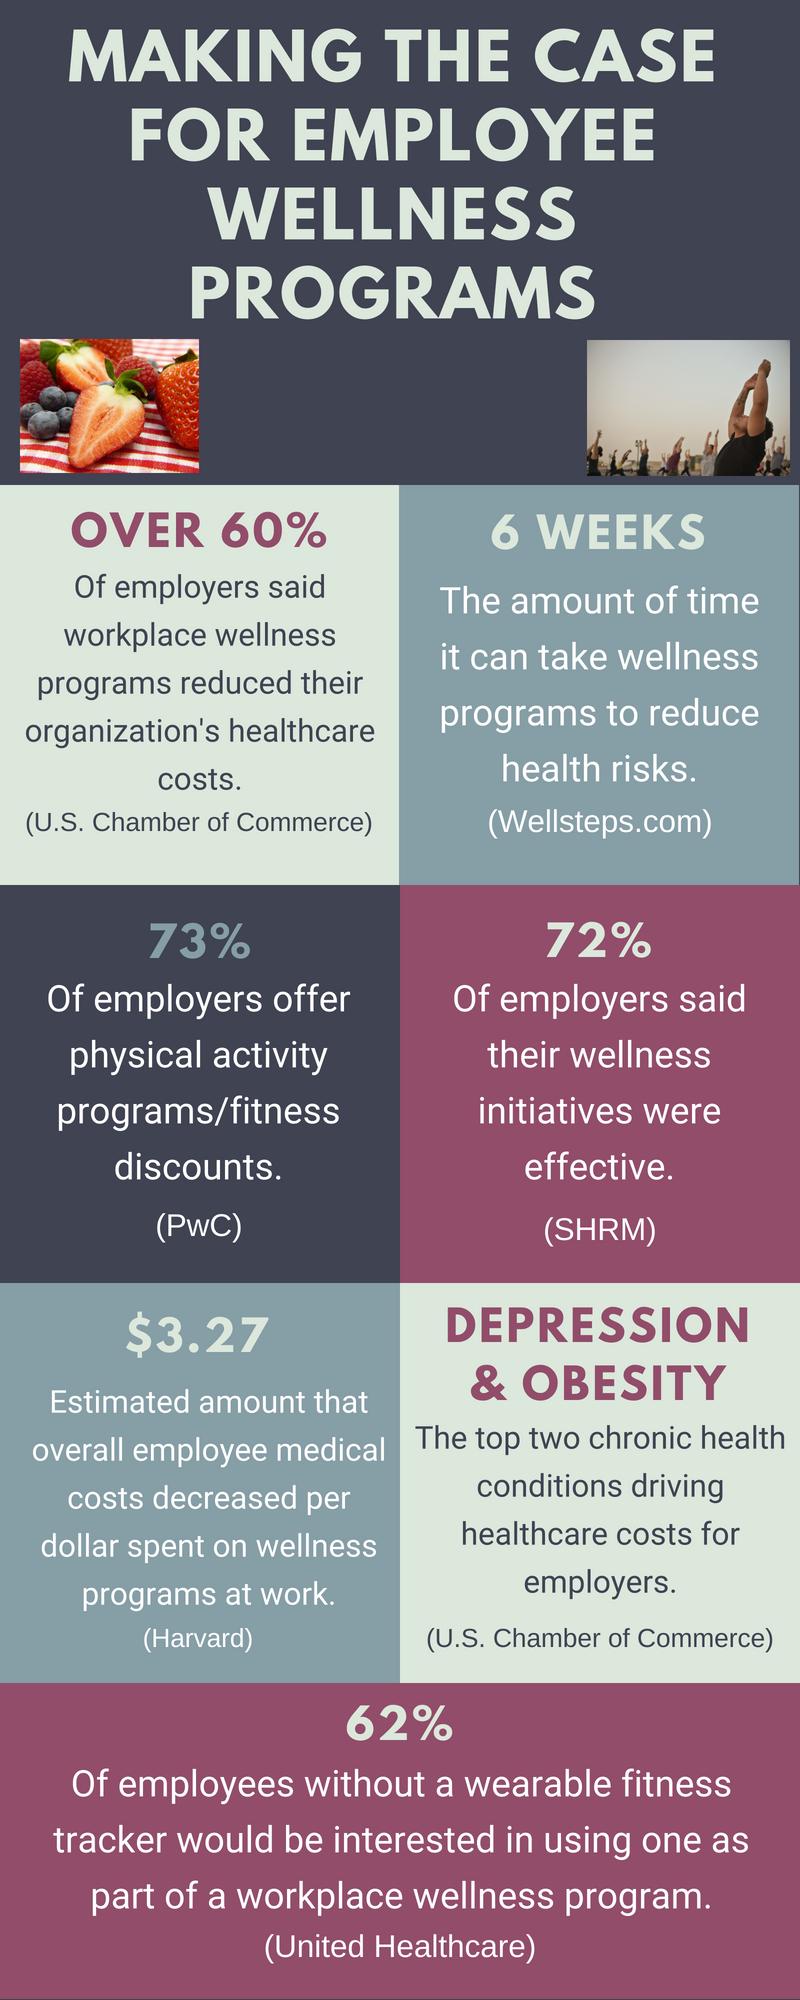 6 employee wellness program ideas to benefit your bottom line